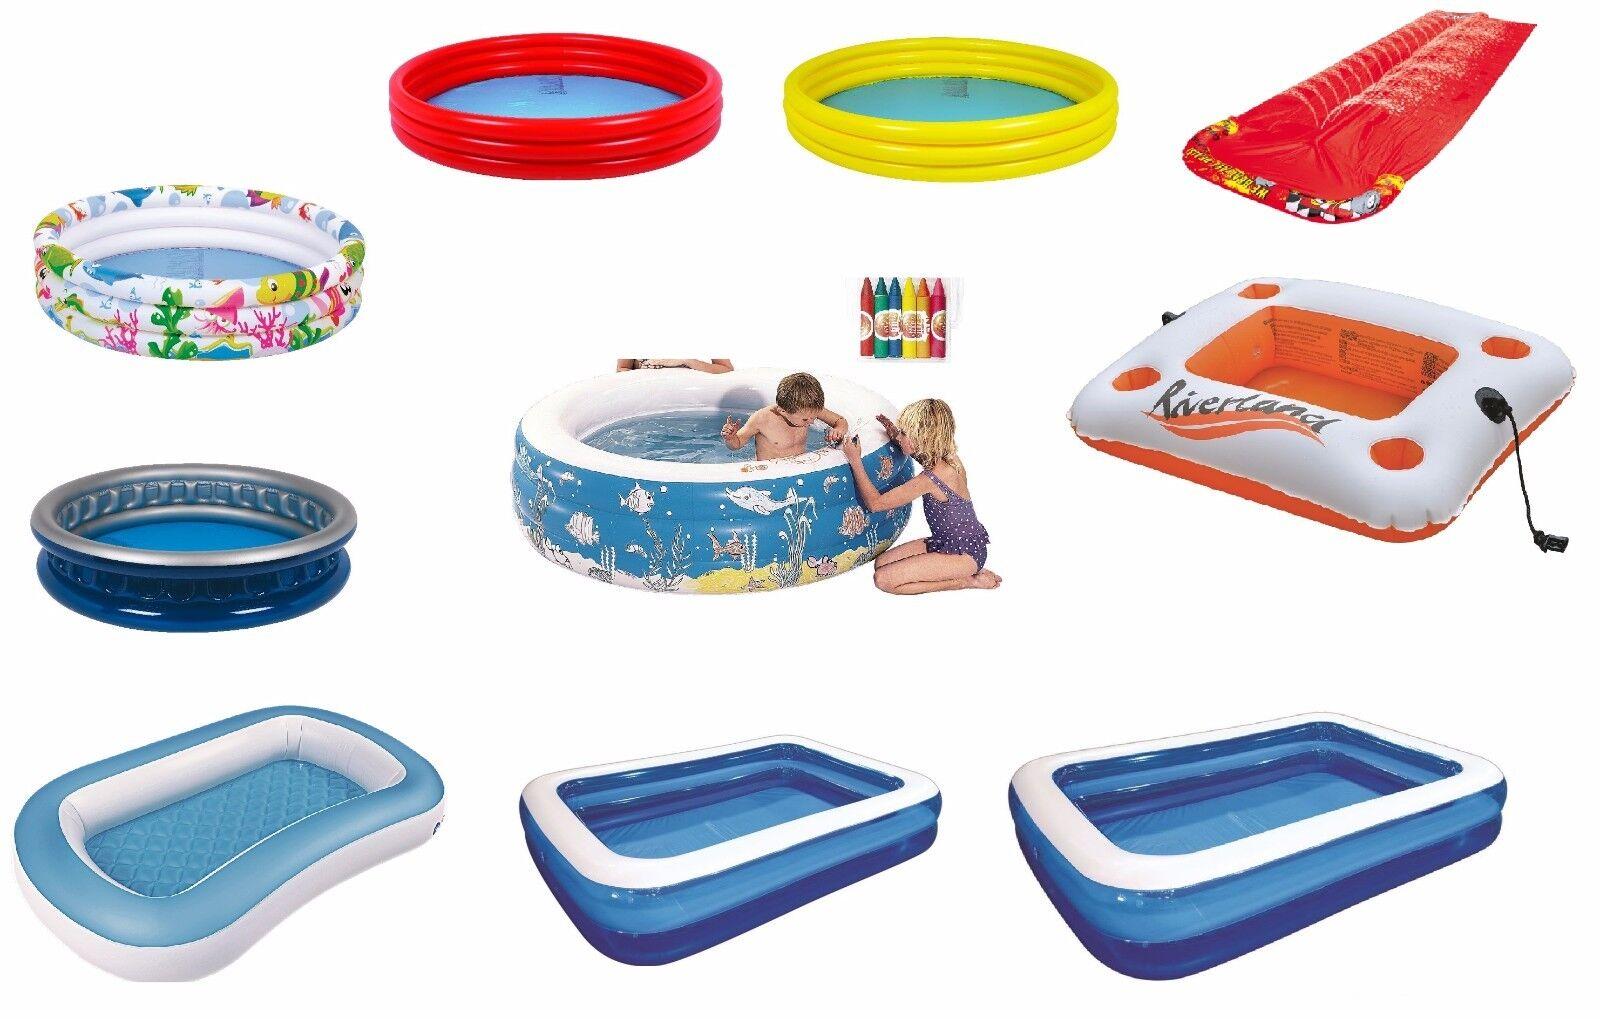 Inflatable Rings Pools, Slip n Slid, Square Rectangular Pools Swimming Pool Lilo